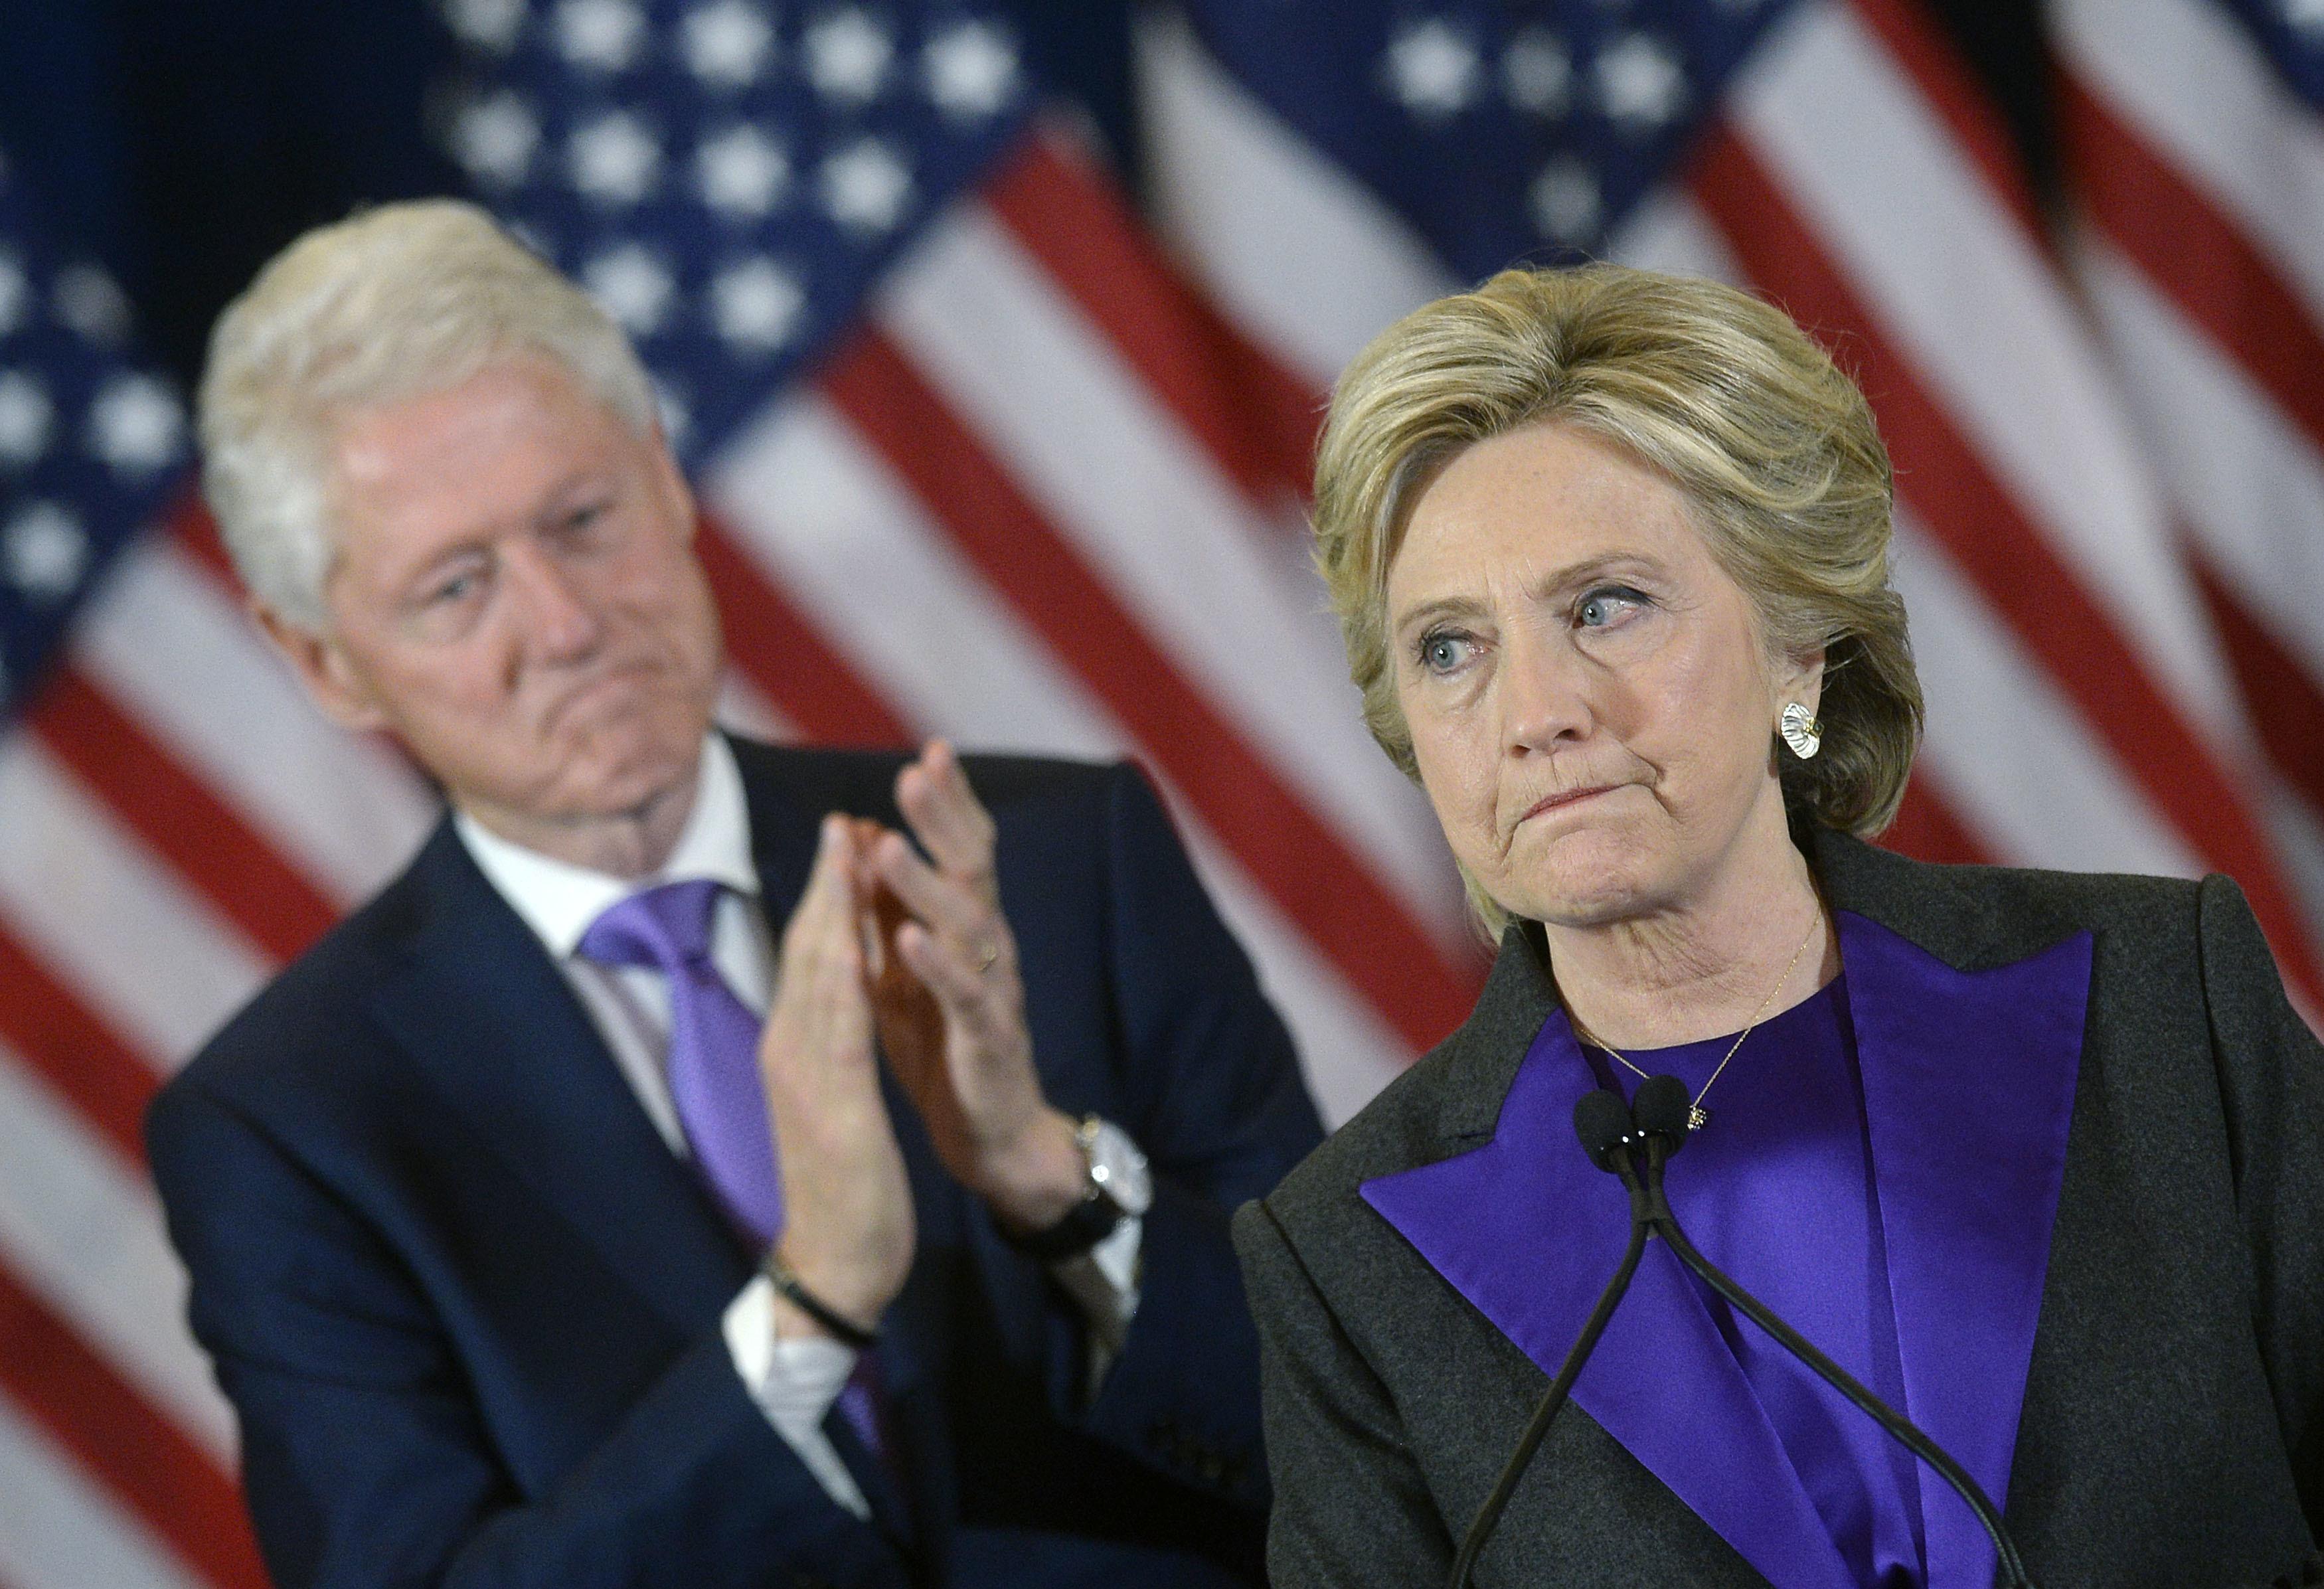 Mysteriöse Todesfälle aus den Kreisen der Clintons - die